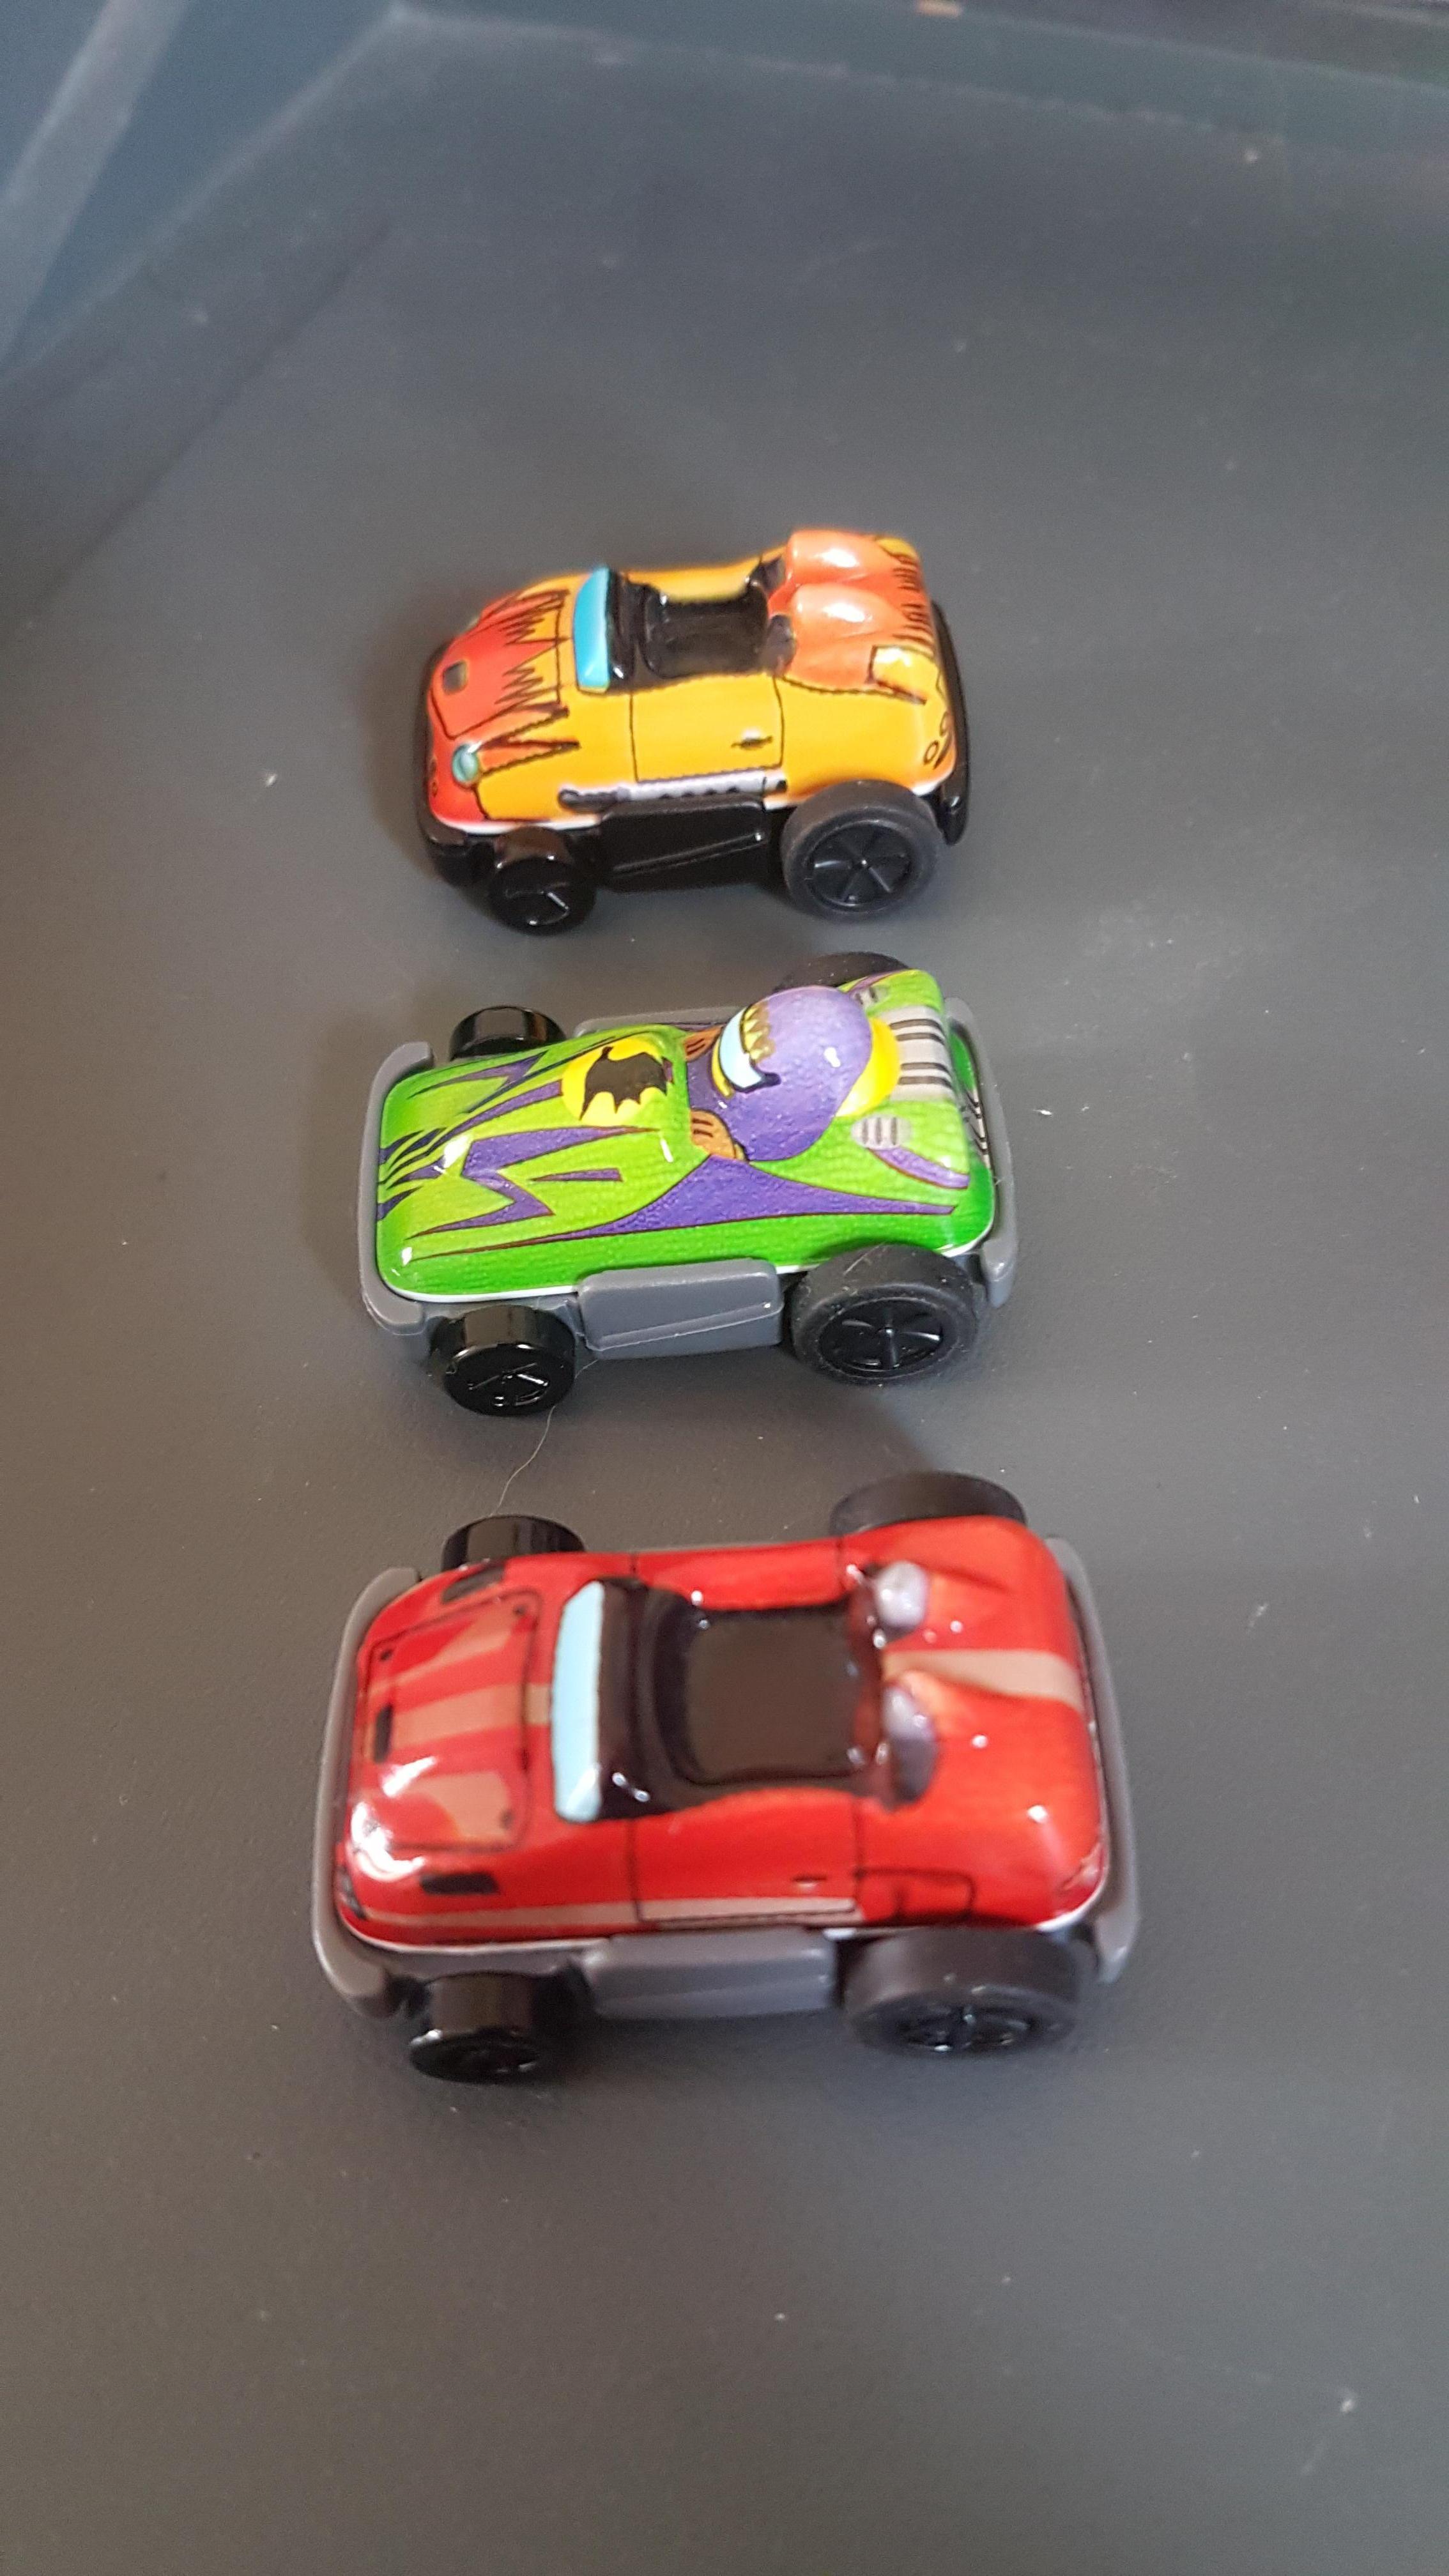 troc de troc reserve 3 voitures kinder image 0